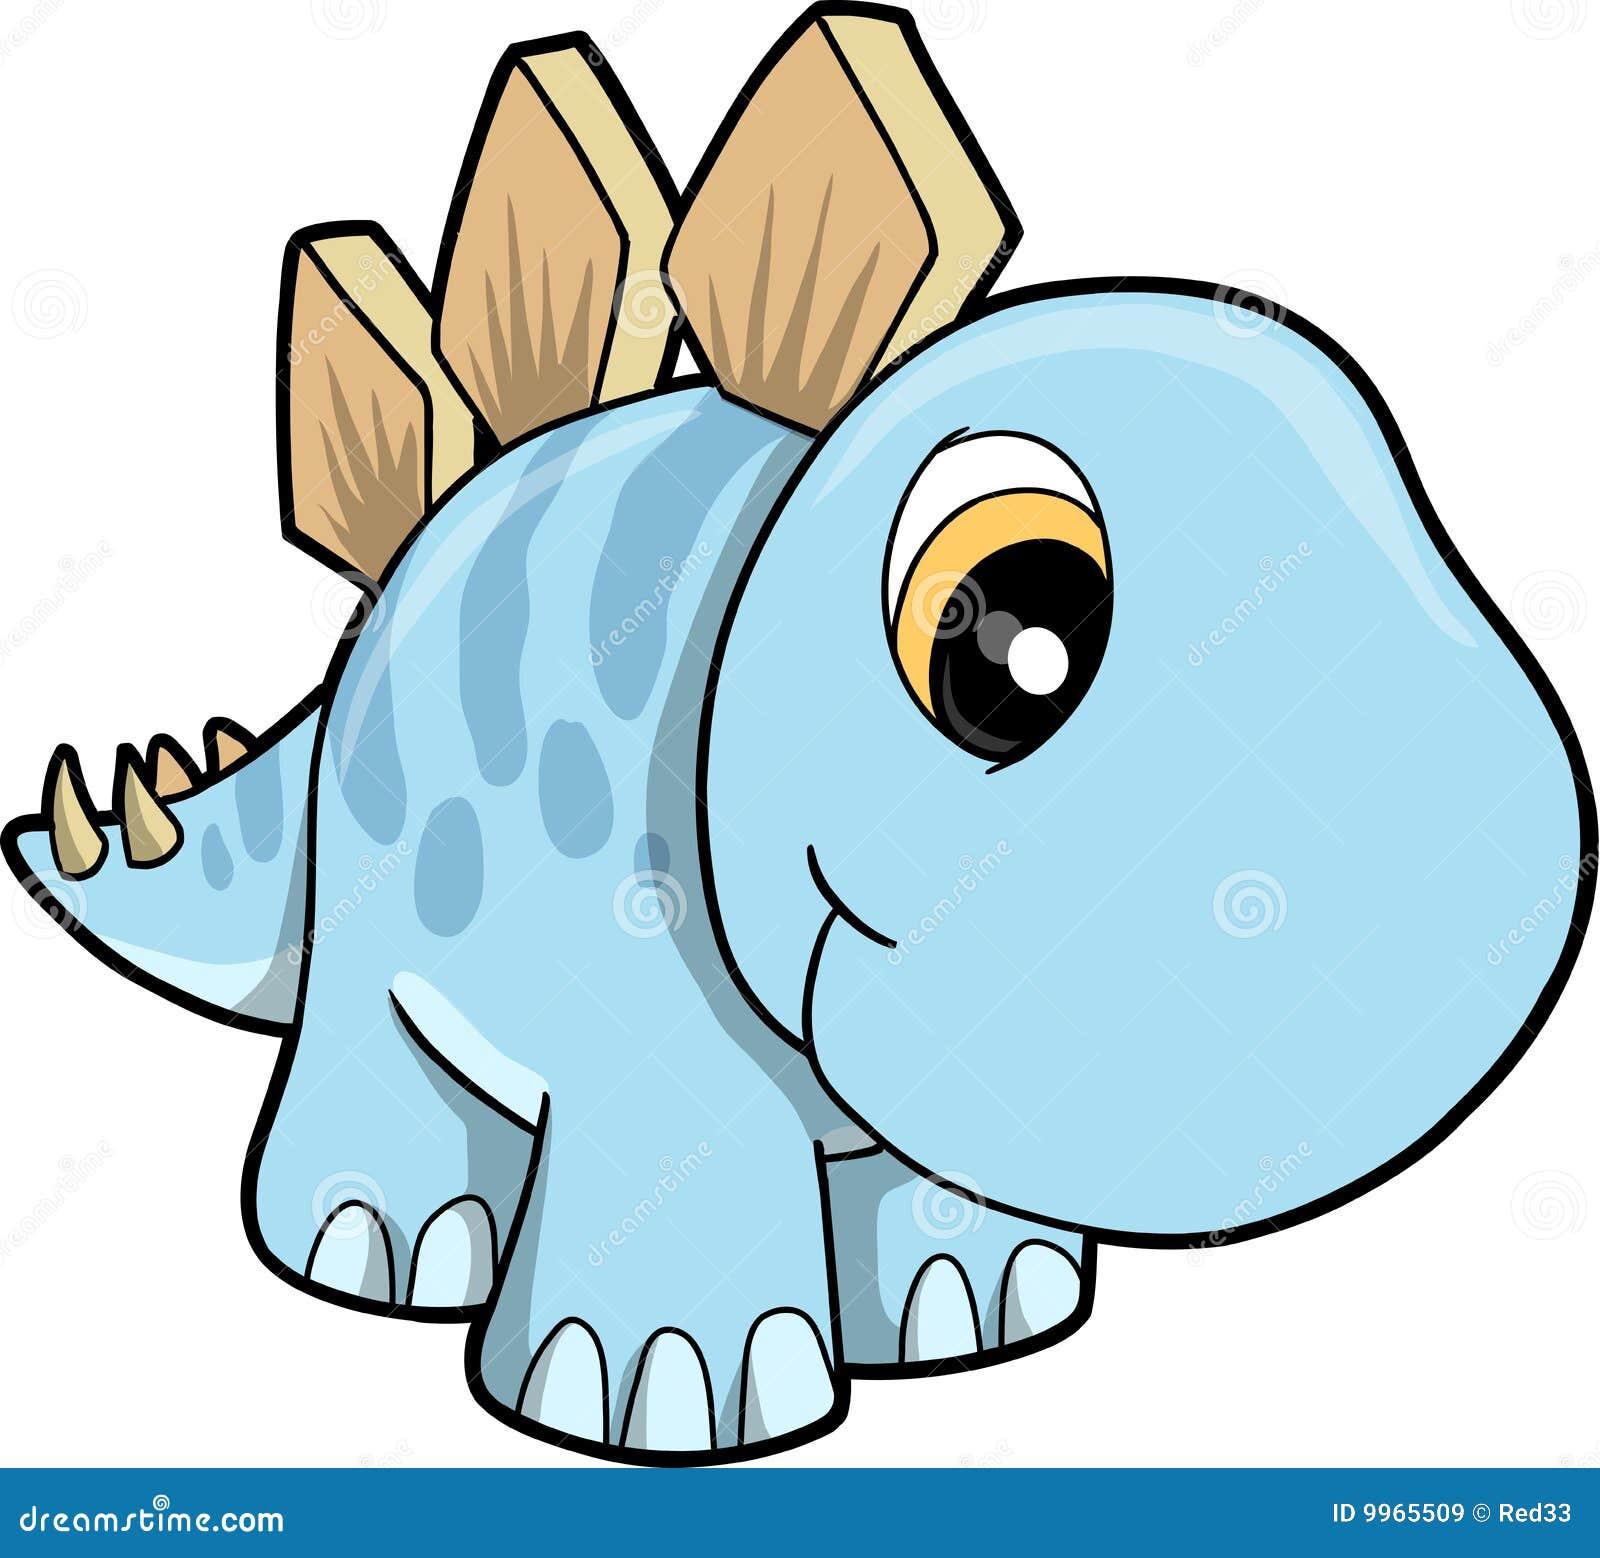 Uncategorized Cute Stegosaurus cute stegosaurus vector illustration stock image 9965509 illustration